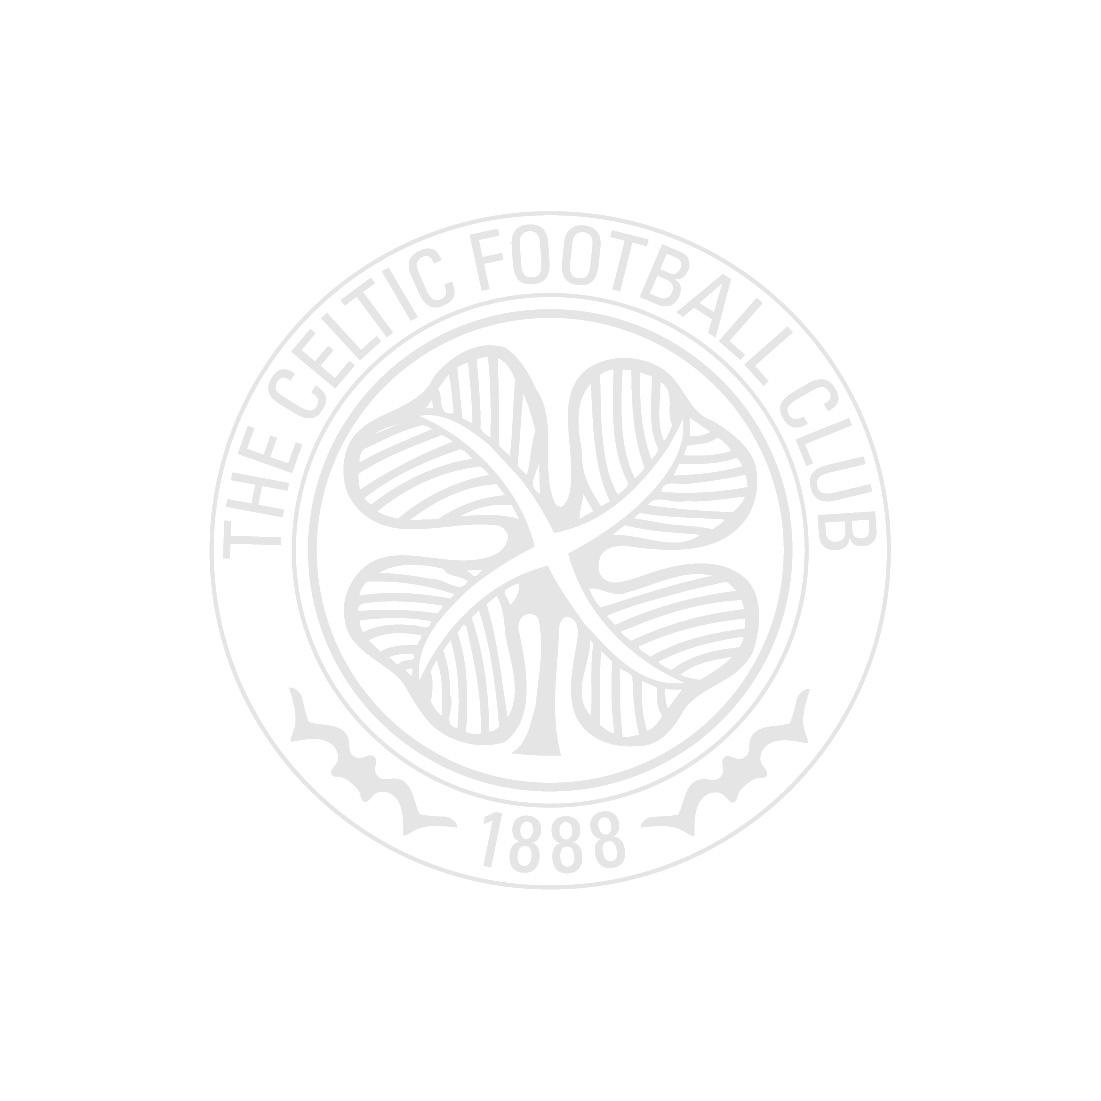 Celtic Mens Third Shirt 17/18 with Sponsor